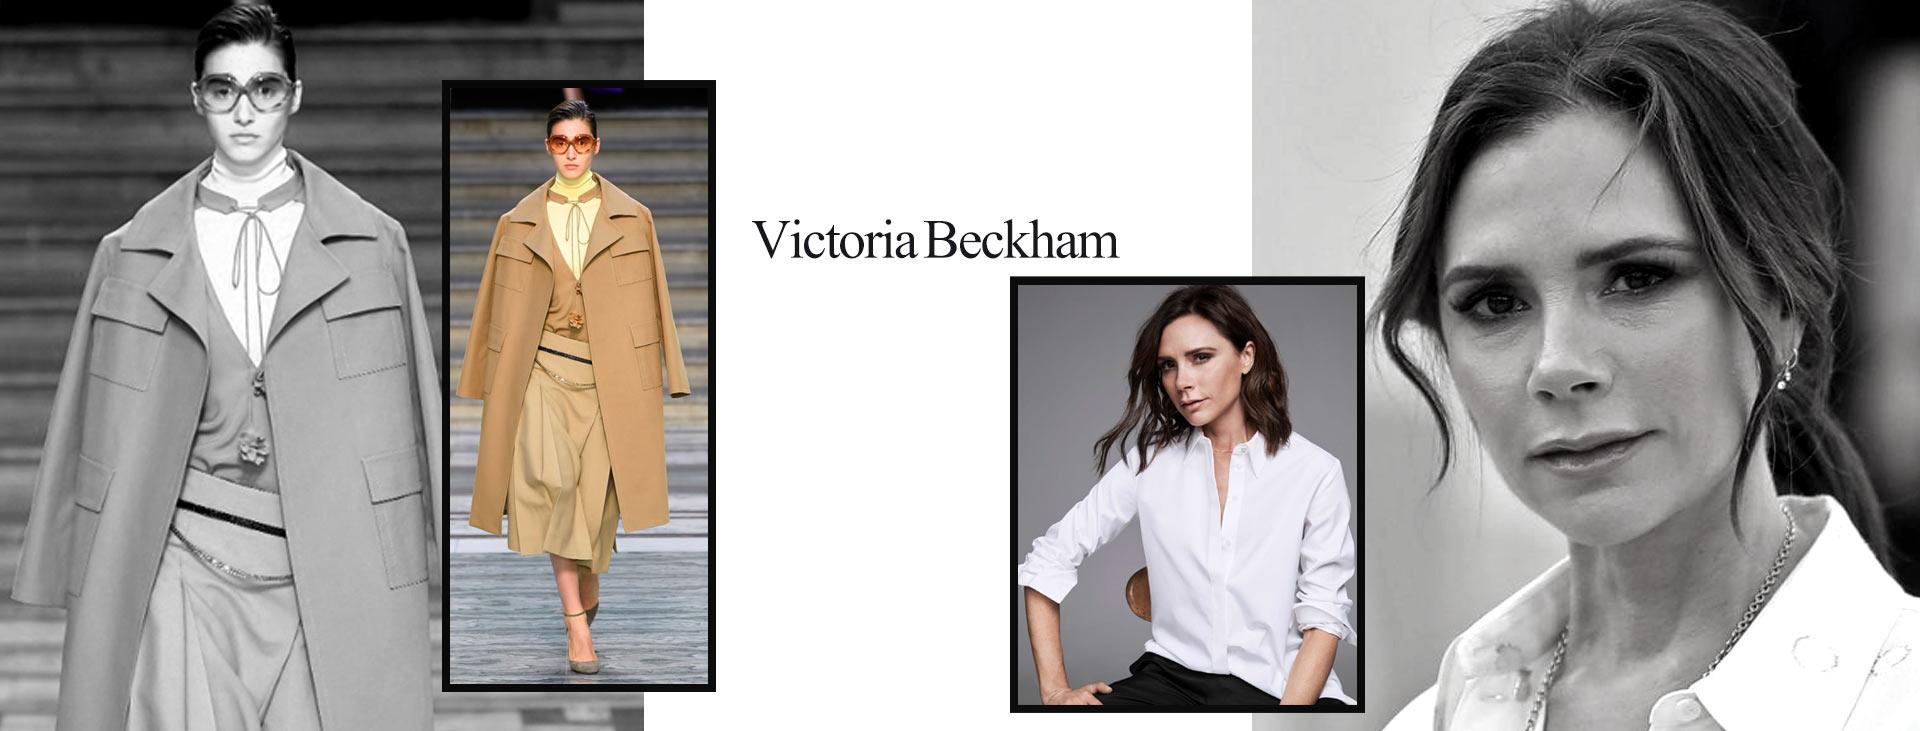 Victoria Beckham 1 - زنان پیشگام در صنعت مد